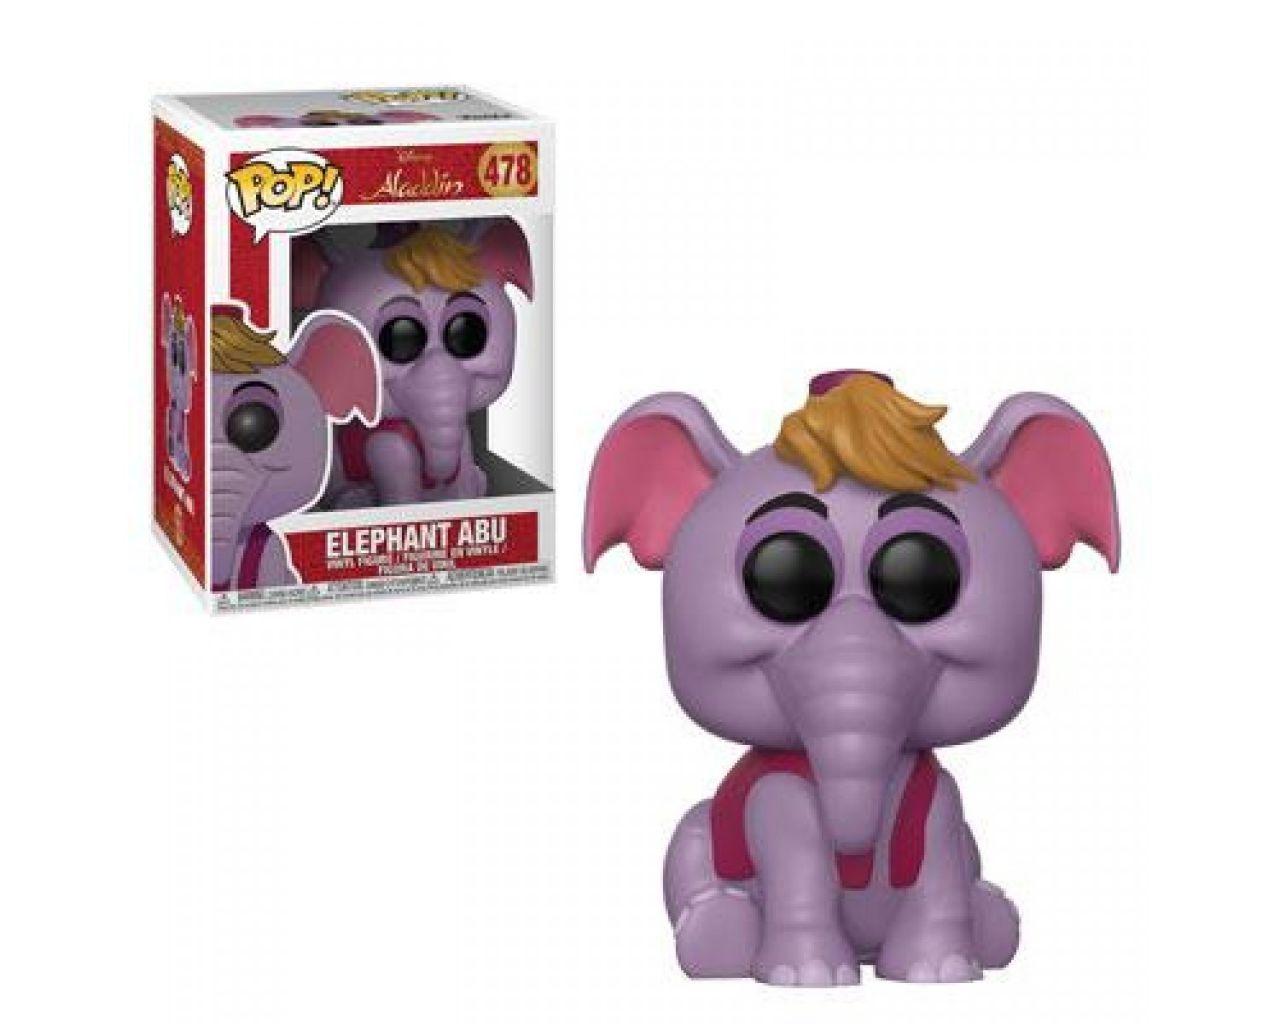 Disney Aladdin ELEPHANT ABU #478